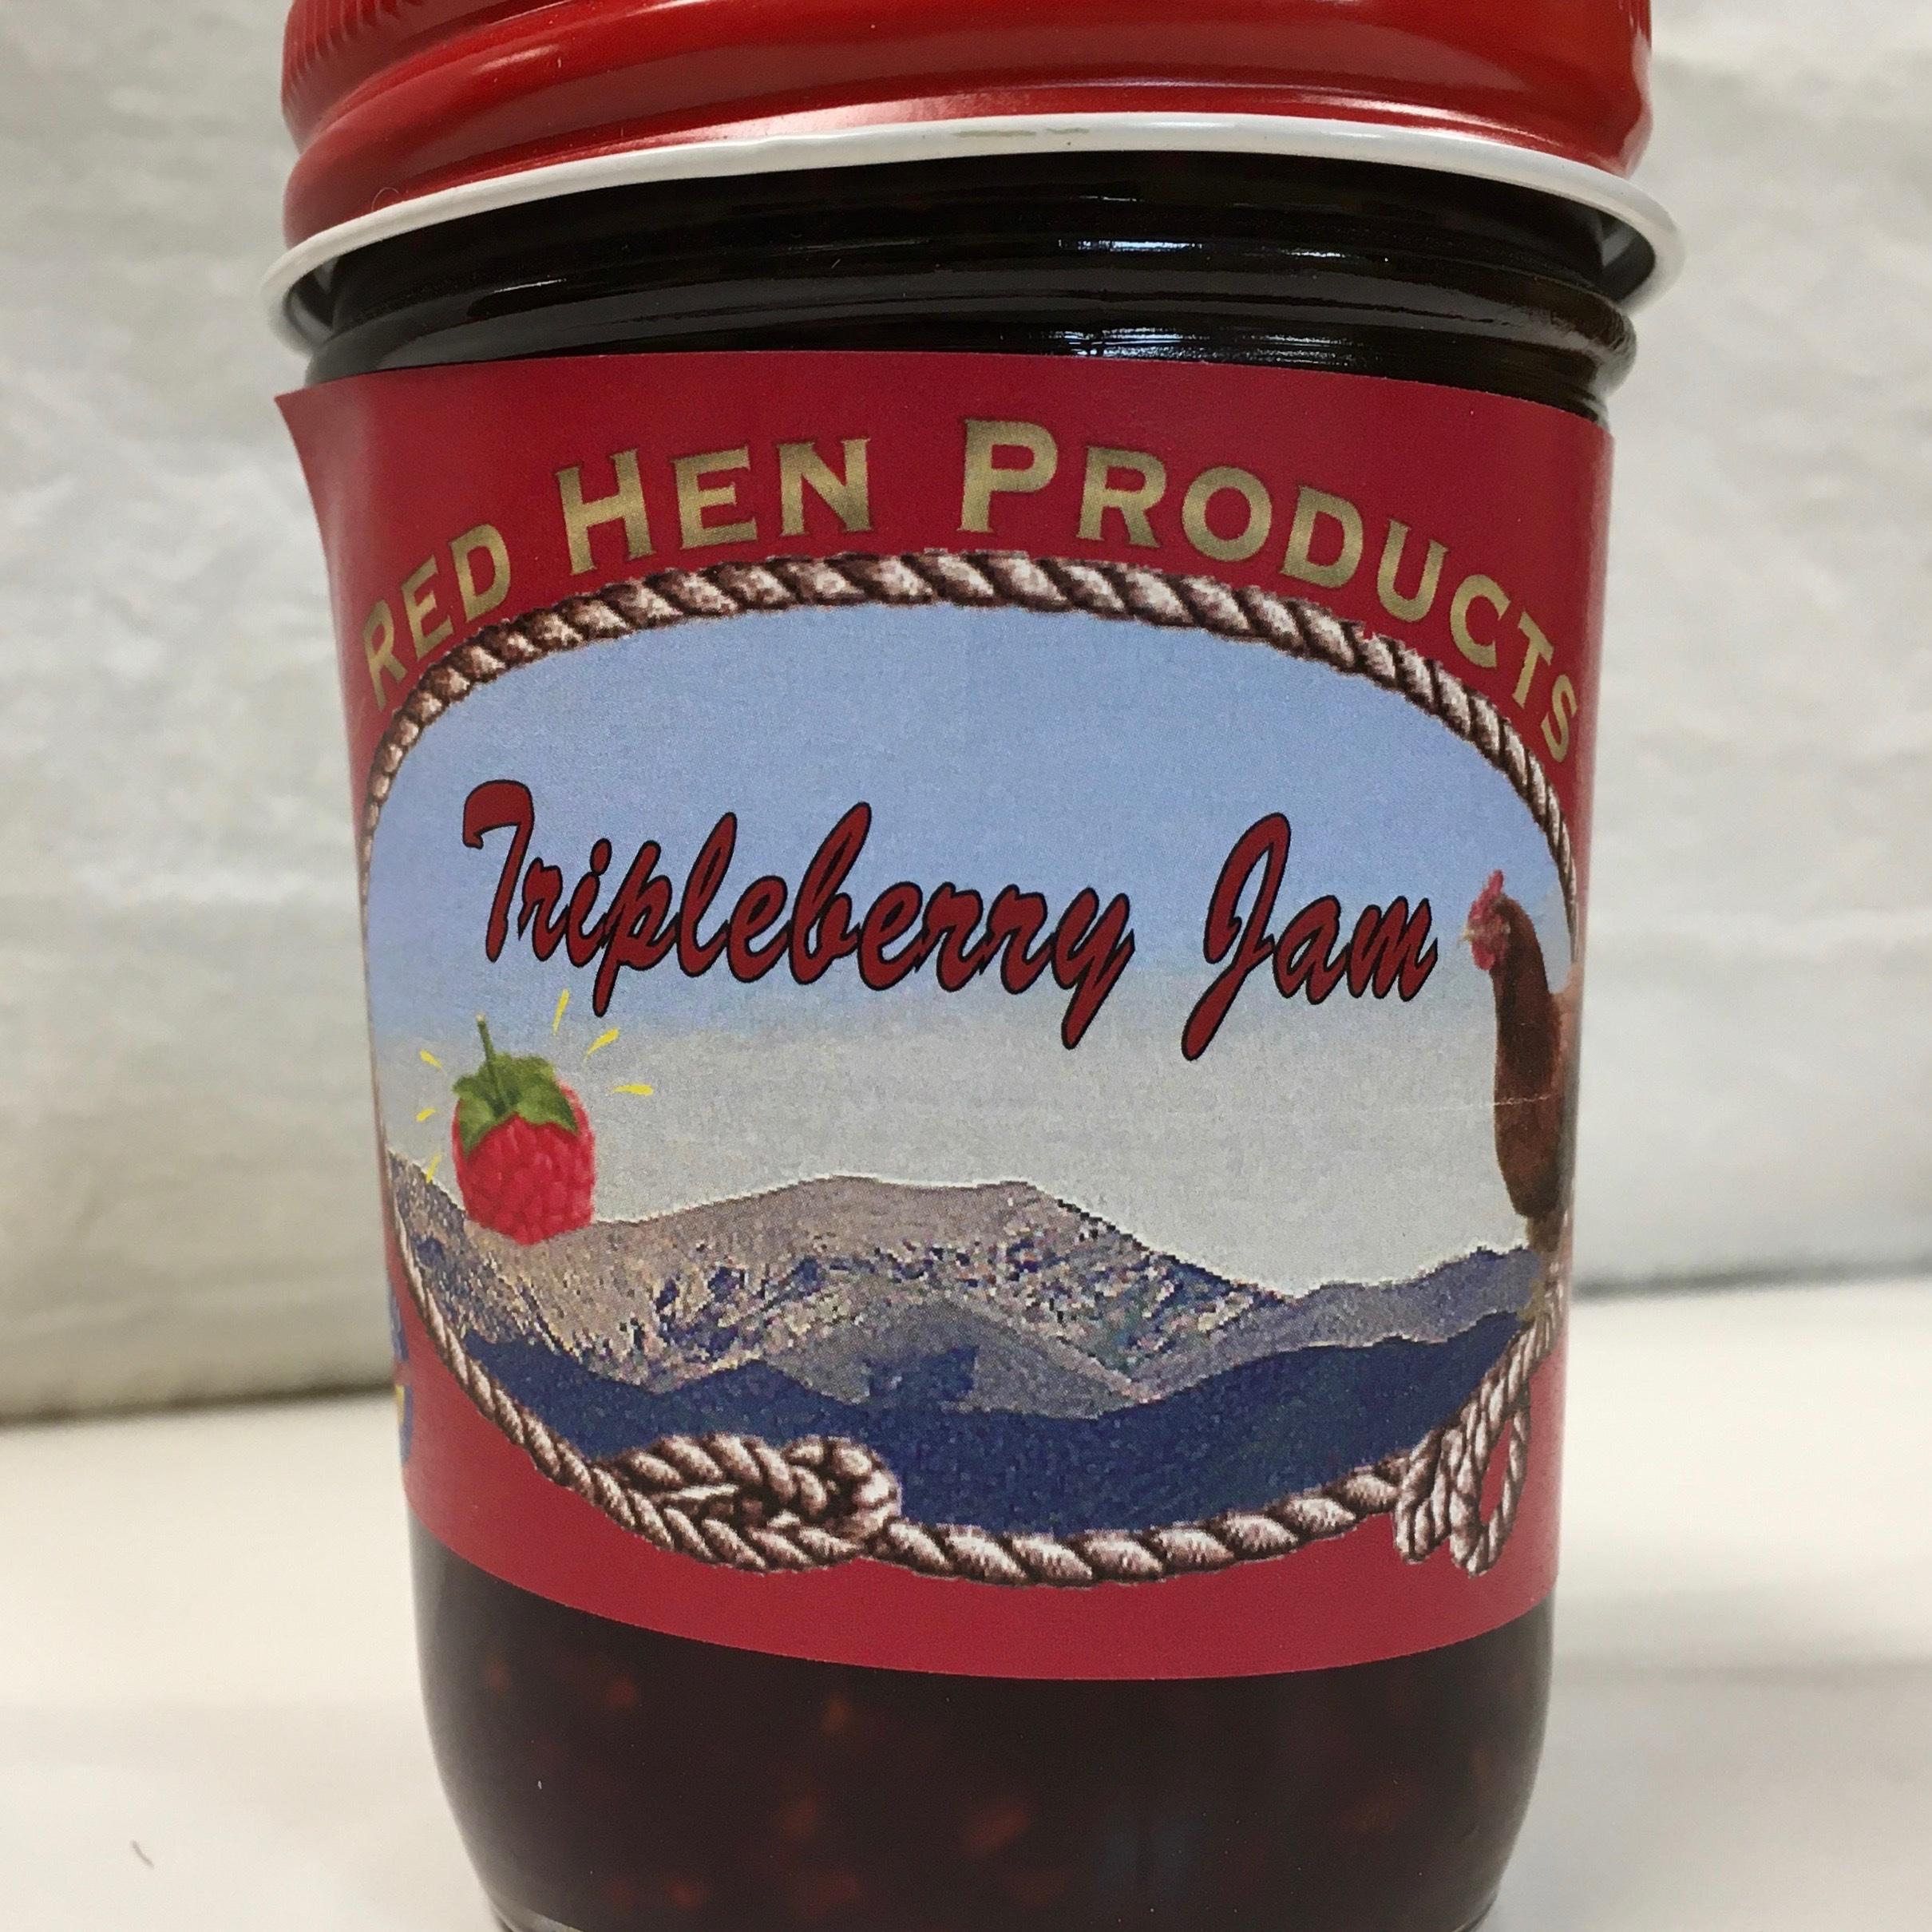 Red Hen Tripleberry Jam